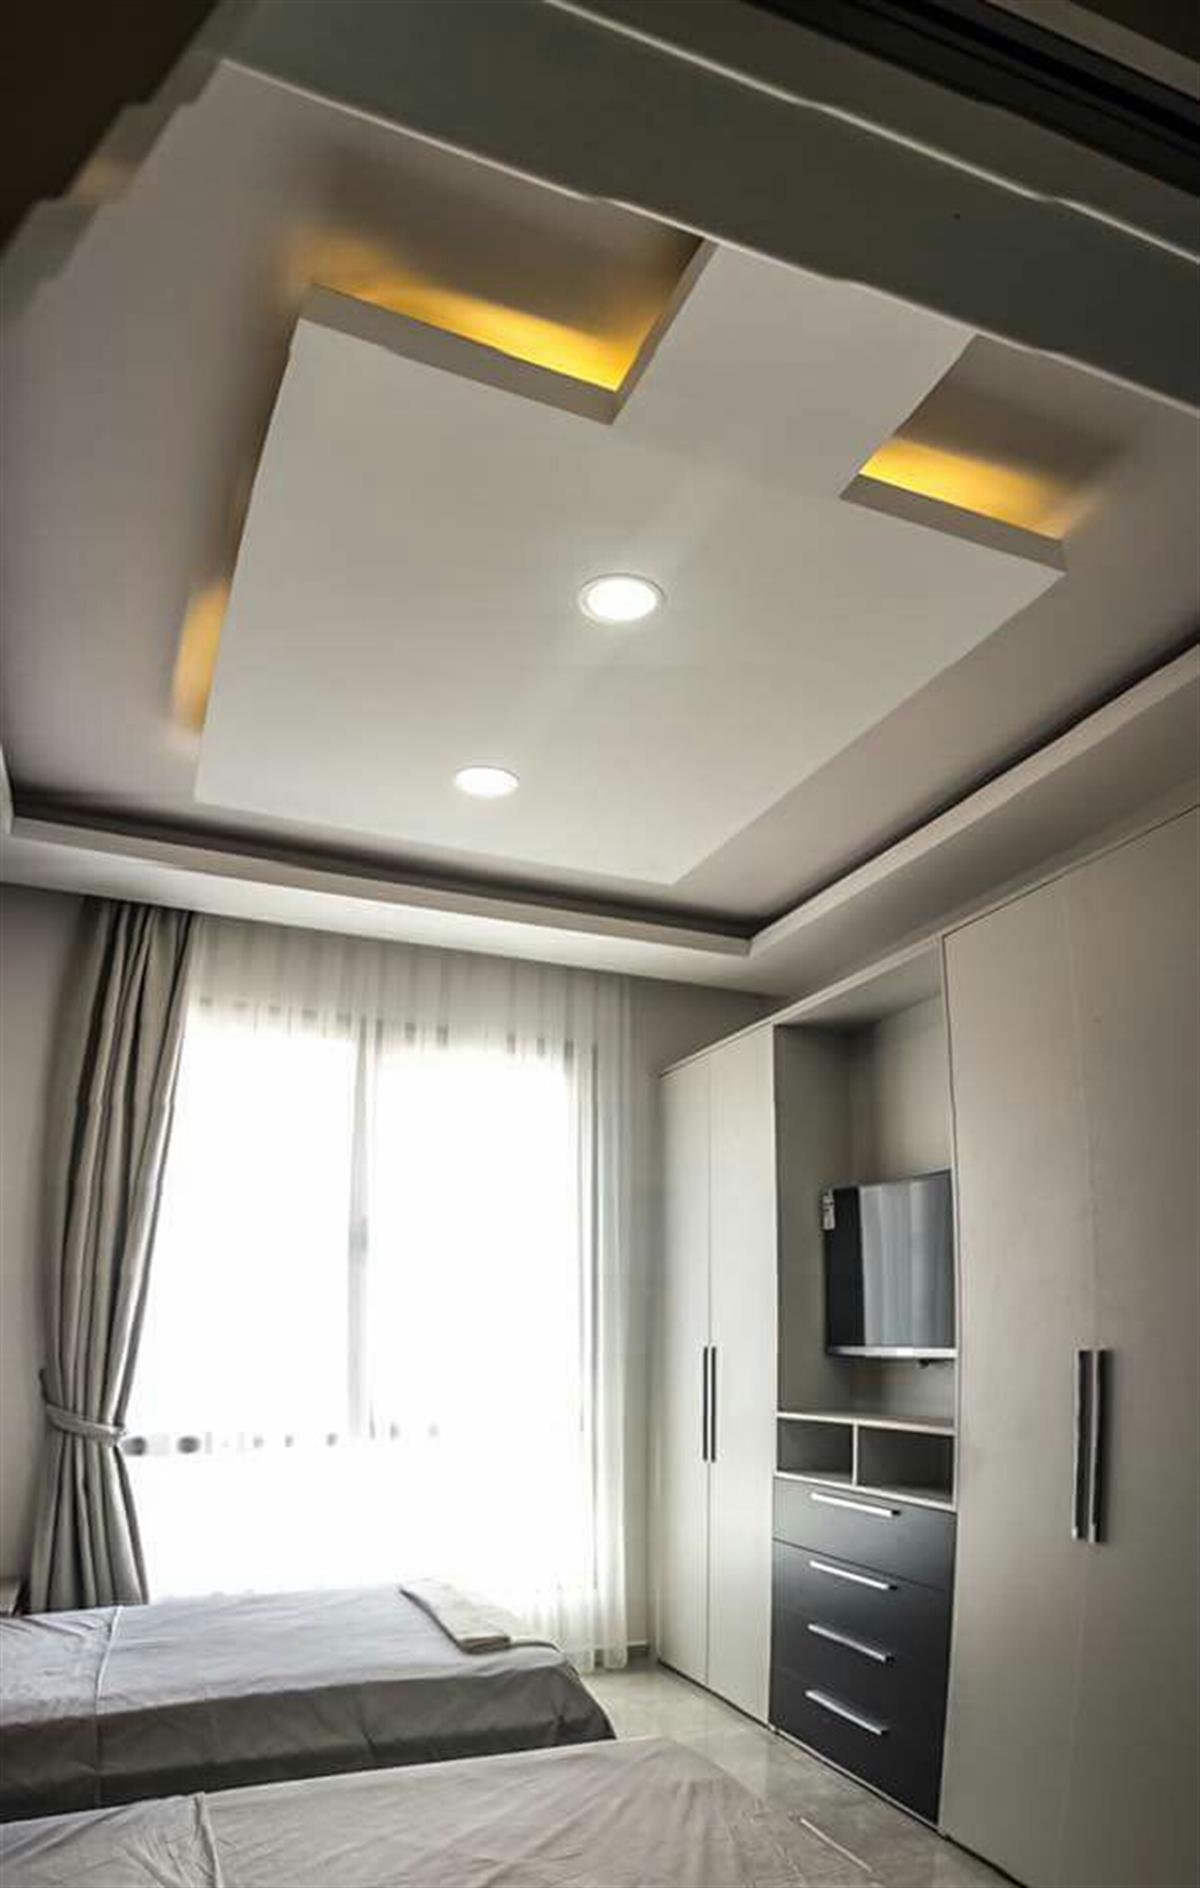 Prime Living Dormitory Dormitories Cafeterias Directorate Emu Security Wiring Diagram Manager Meryem Bonak